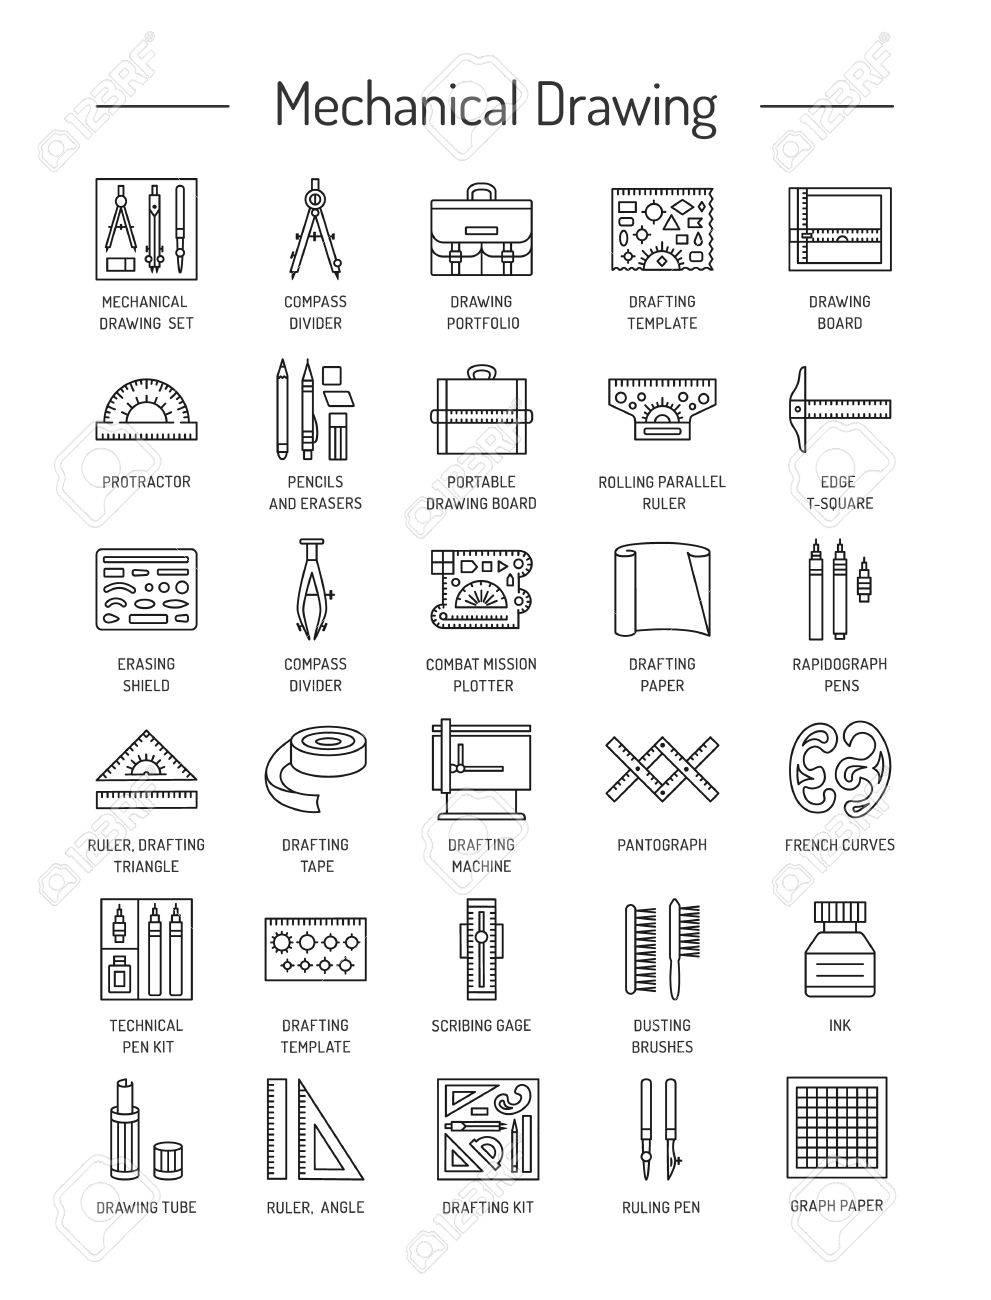 Coleccin de iconos de herramientas de dibujo dibujo tcnico kit de dibujo regla tablero de dibujo transportador cinta lpiz mecnico tinta divisor brjula instrumentos de dibujo mecnico malvernweather Images